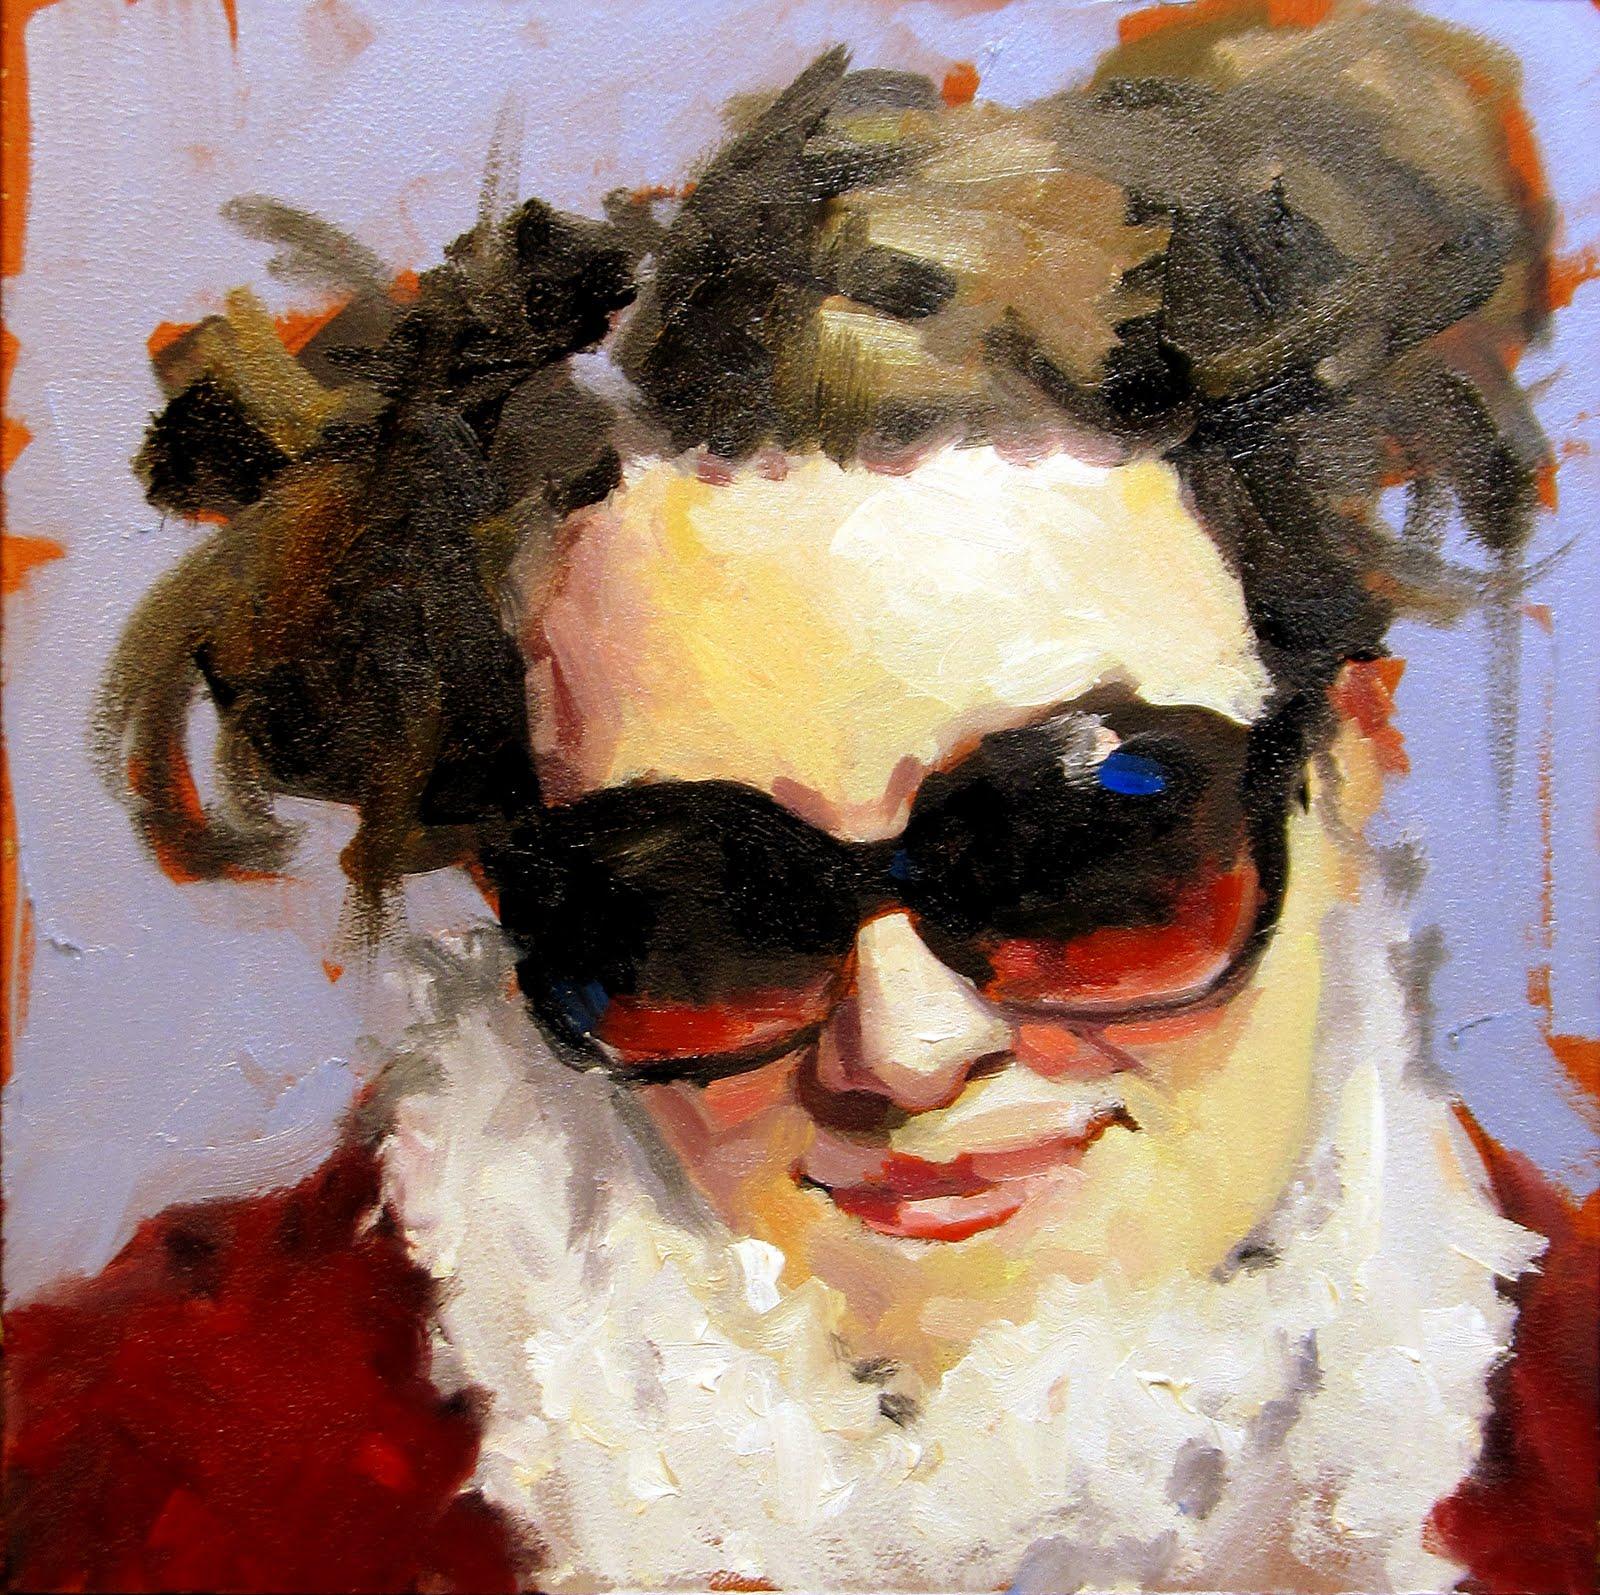 """ART 4 DIAPERS (DAILY DIAPER #165) Sunglasses and Scarf"" original fine art by Brian Burt"